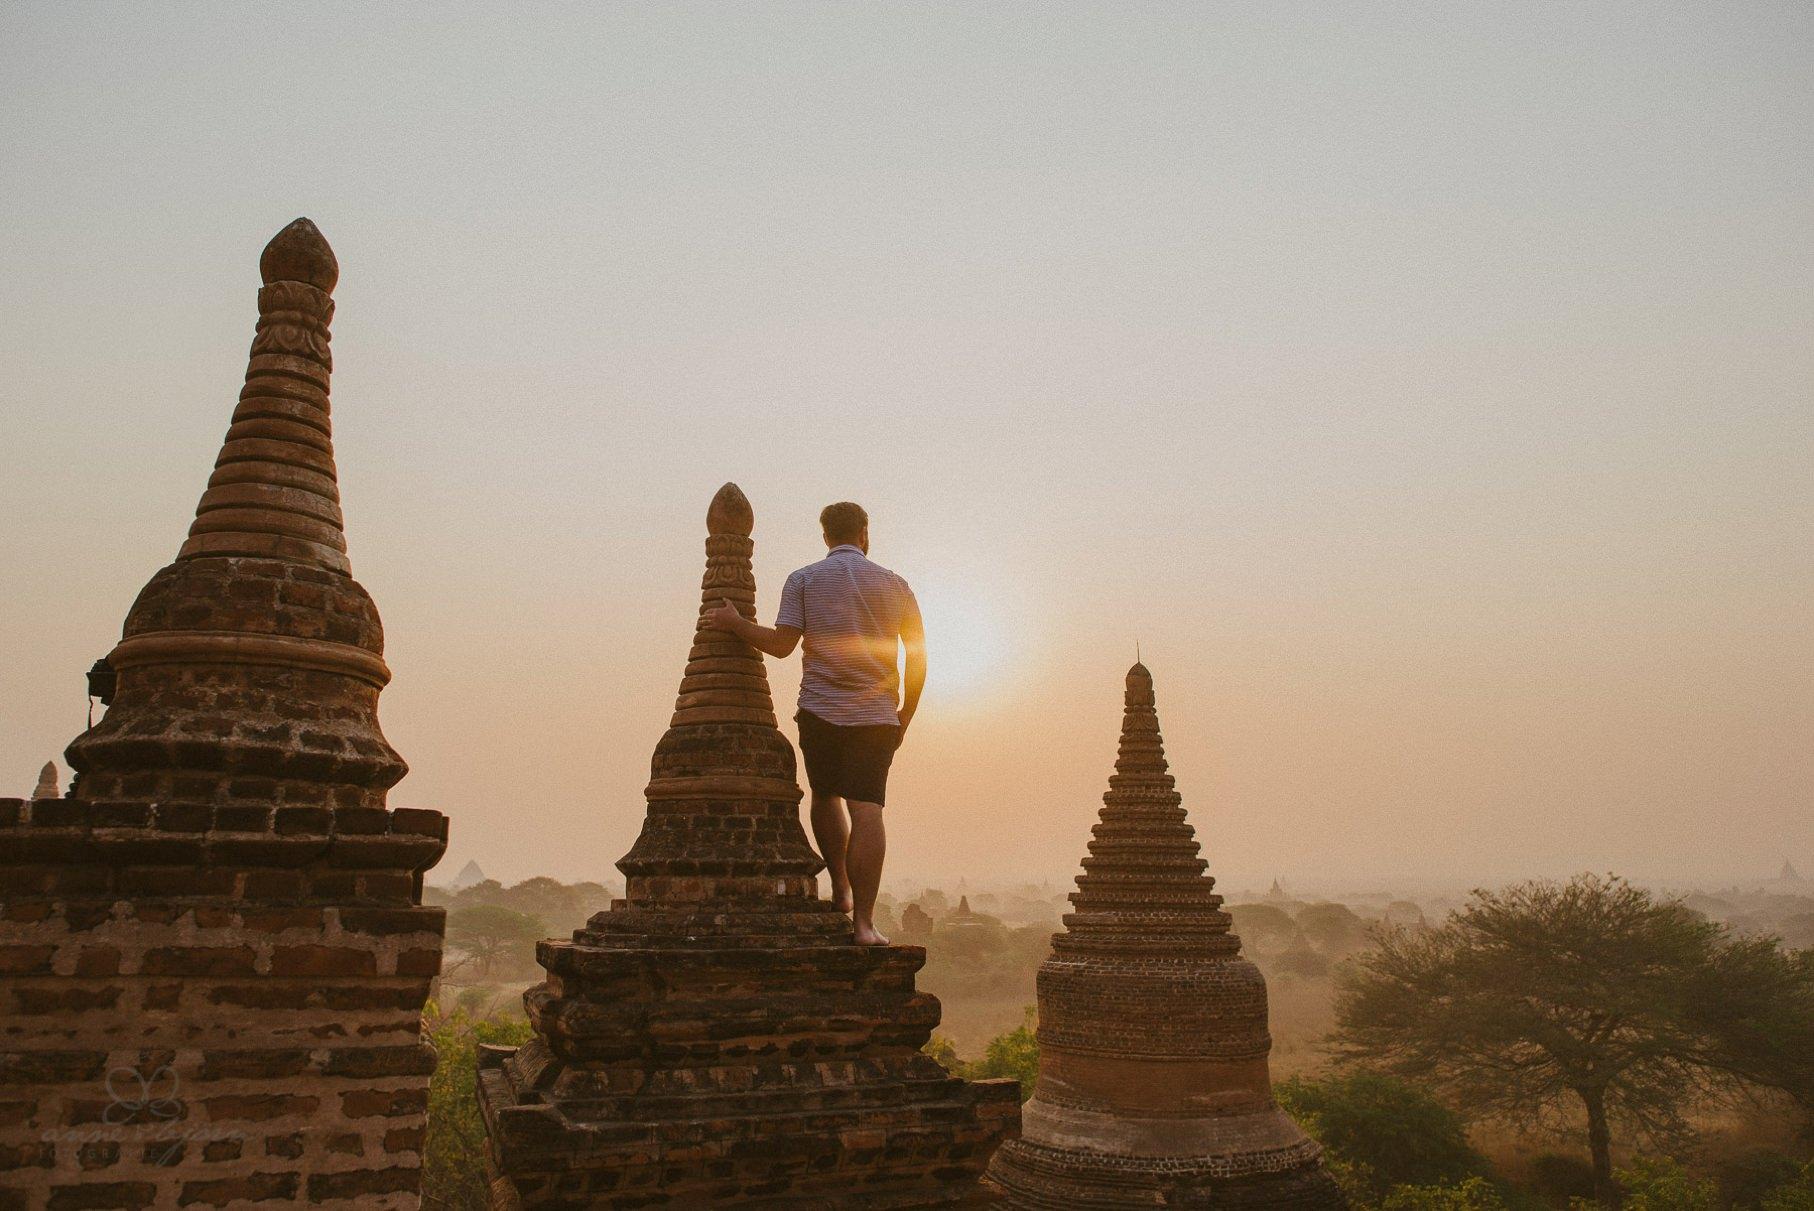 0011 bagan ngwesaung d75 1308 1 - Tempelstadt Bagan & tauchen am Ngwesaungbeach